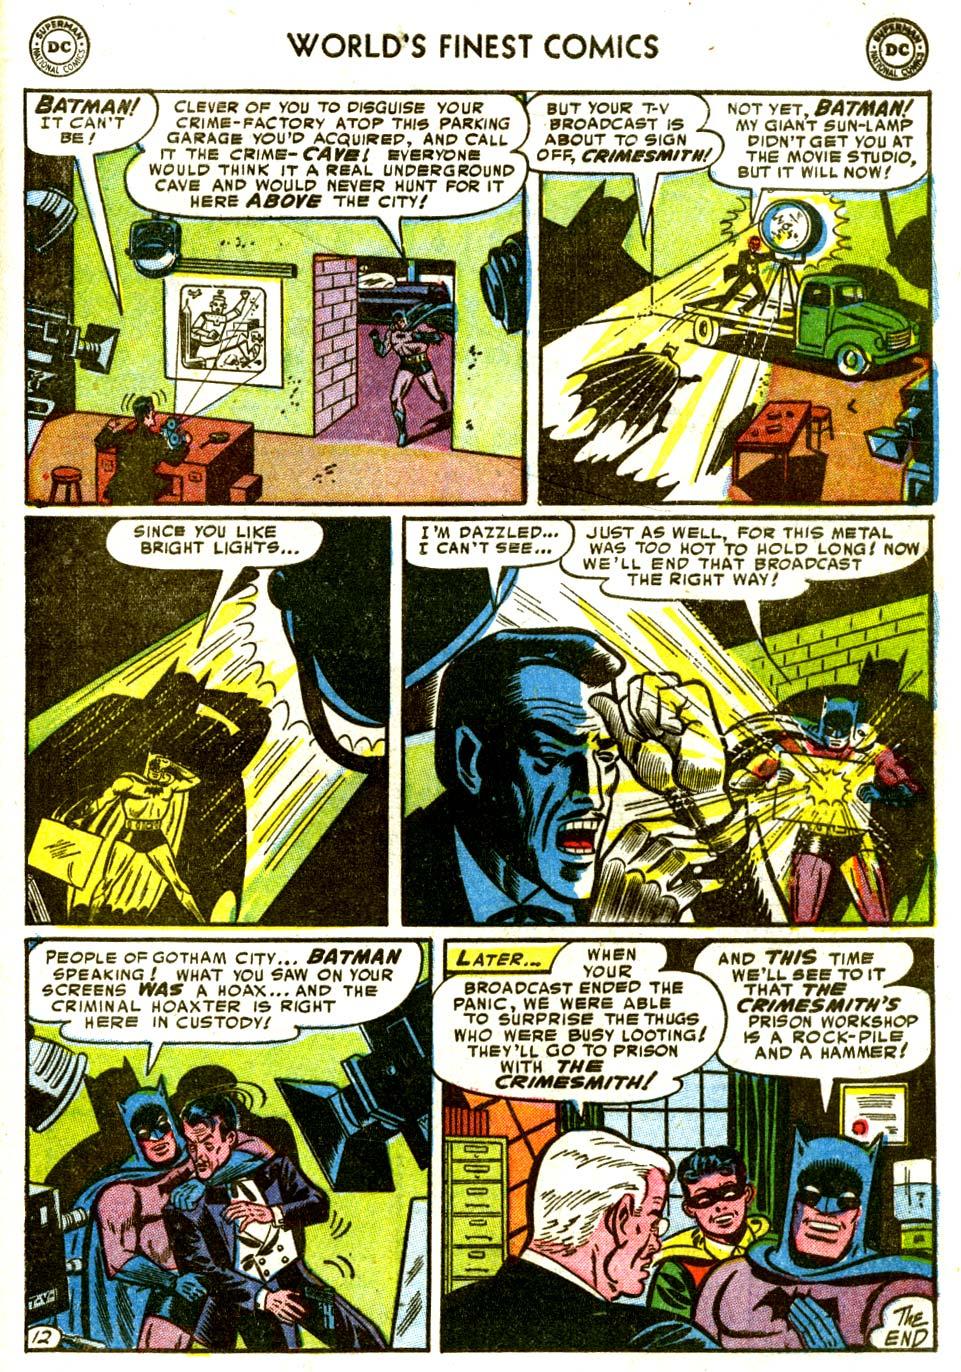 Read online World's Finest Comics comic -  Issue #68 - 65